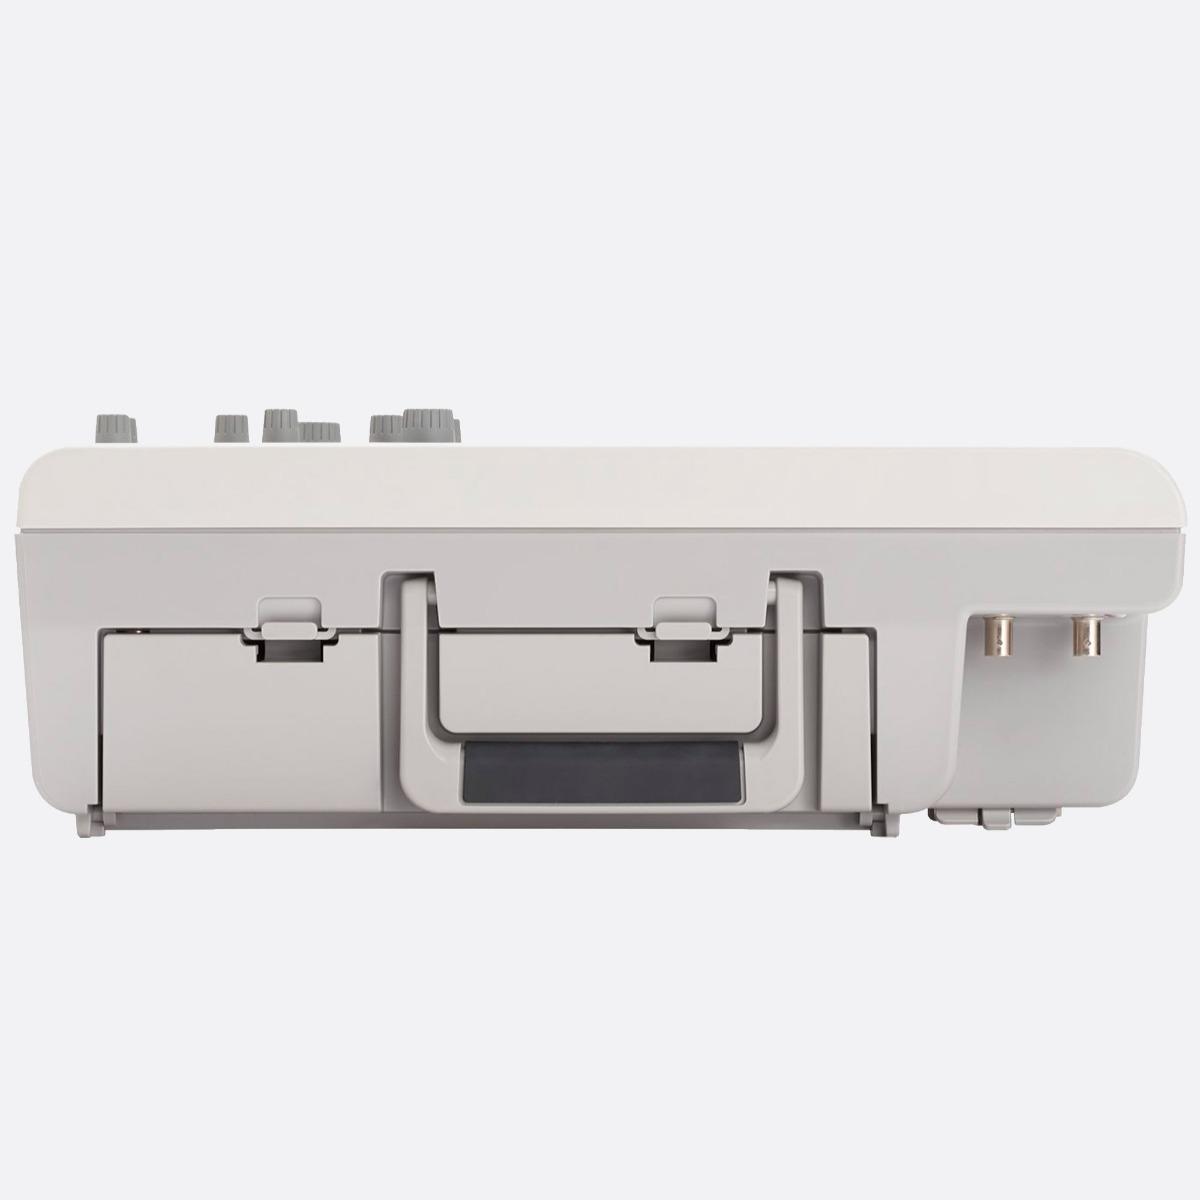 Keysight_DSOX3052T_Top_Ccontrols